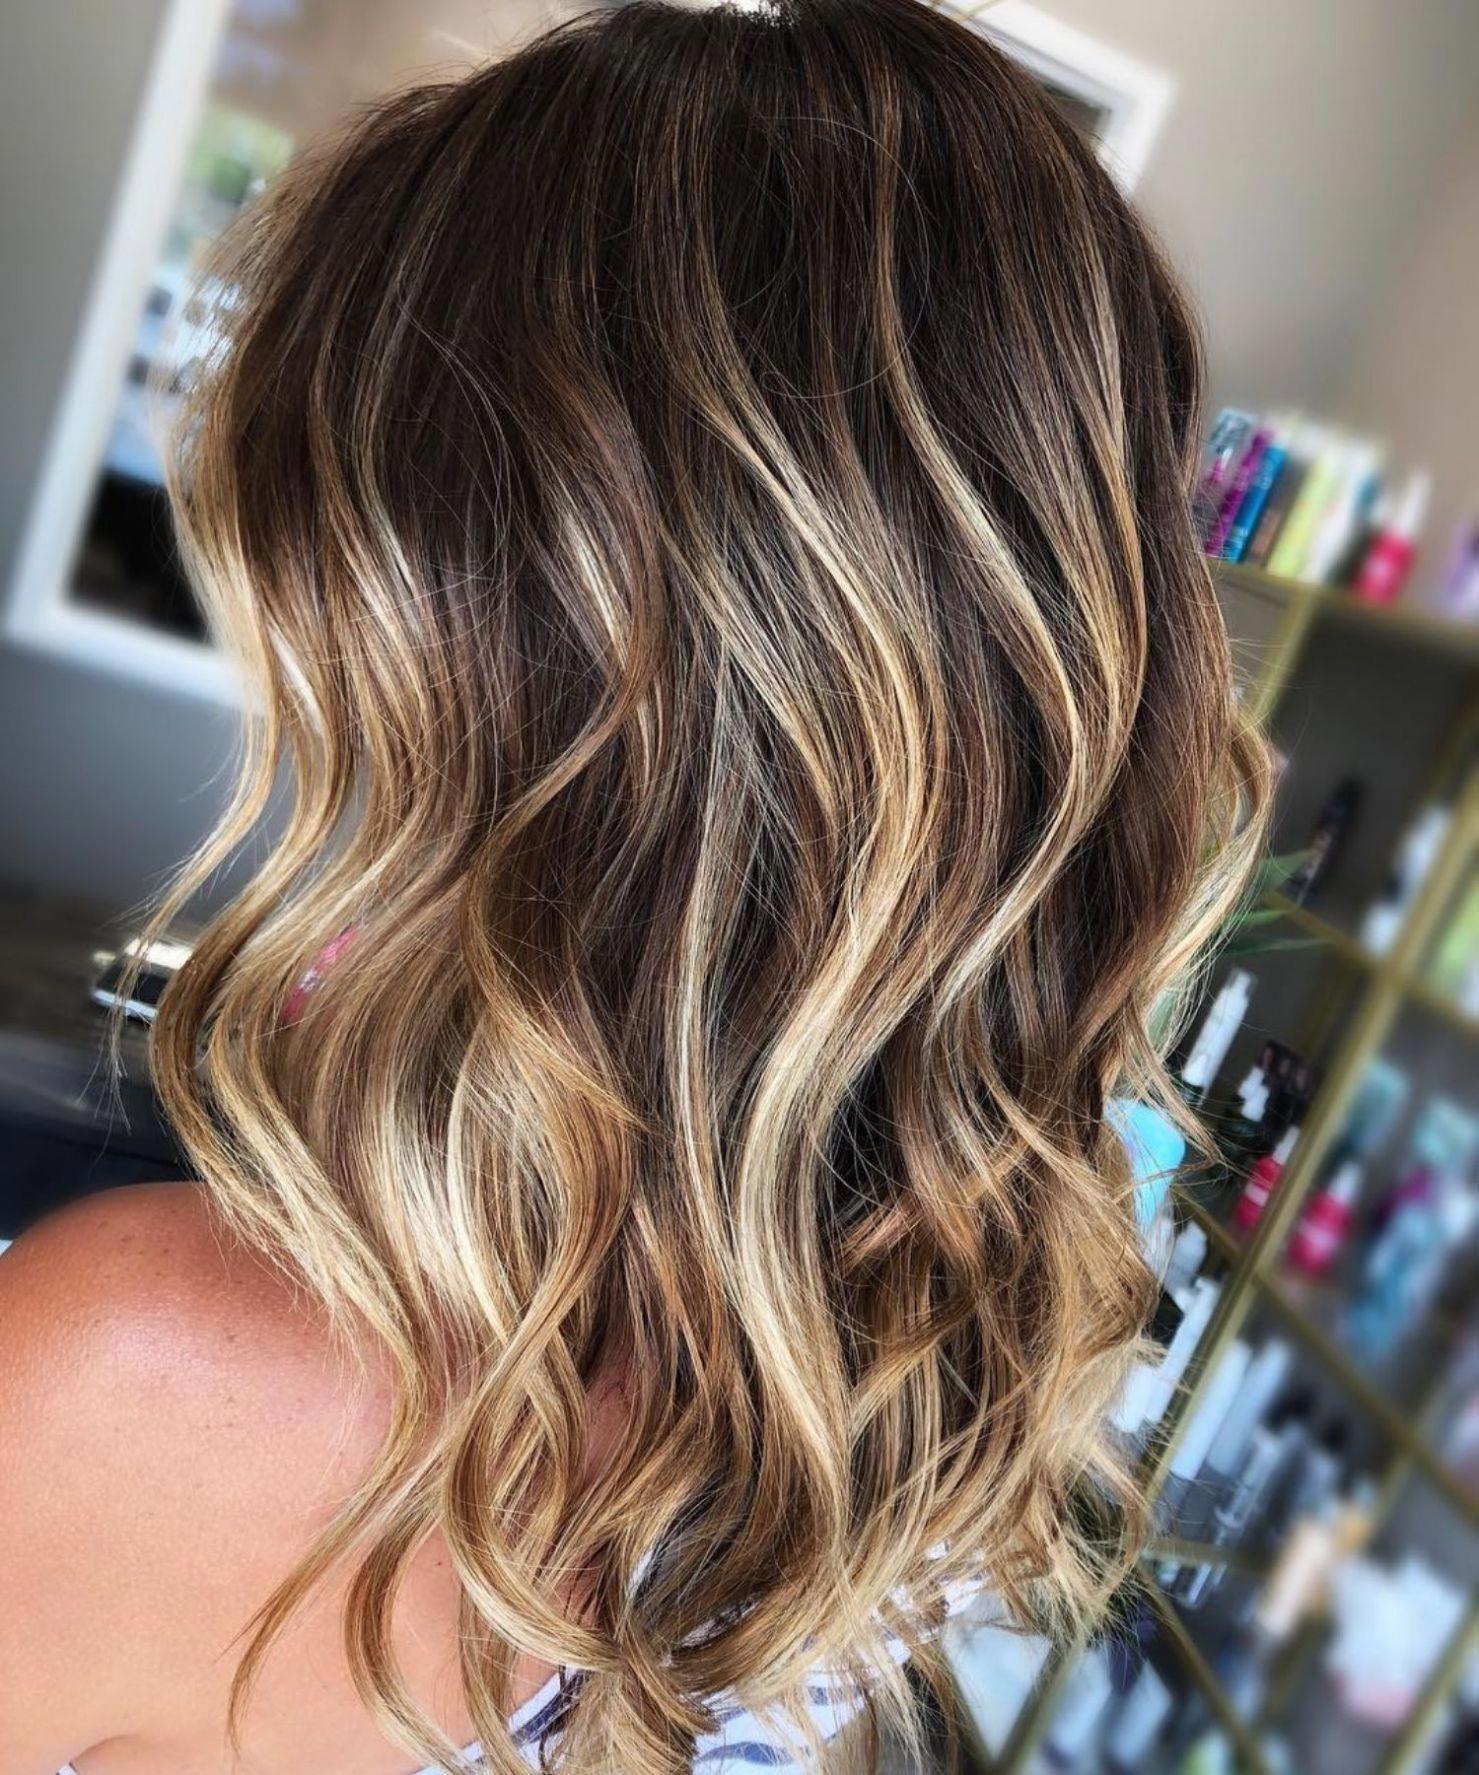 Amazing Caramel Balayage Short Hair Caramelbalayageshorthair Brunette Hair Color Balayage Hair Chocolate Brown Hair Color